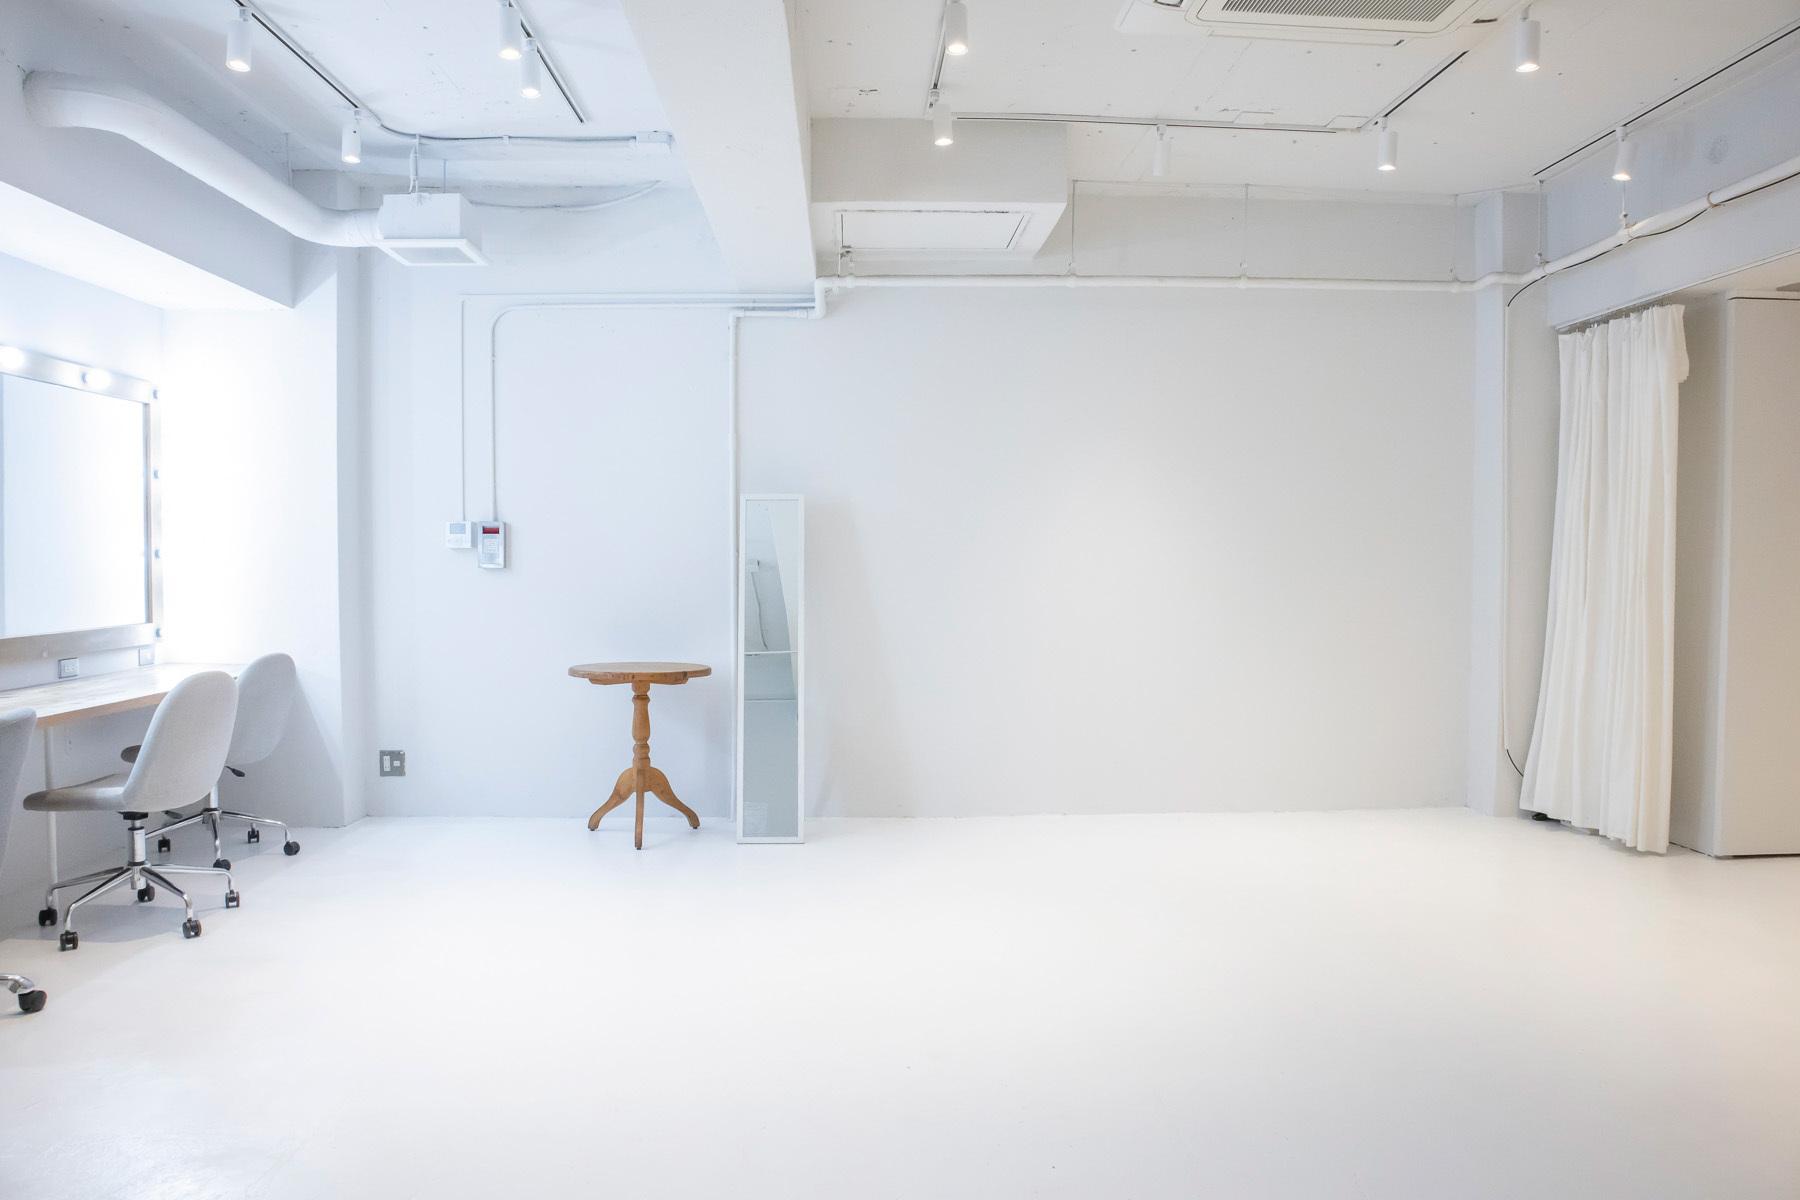 STUDIO SAND 1F(スタジオサンド1F)地下のみの貸出も可能